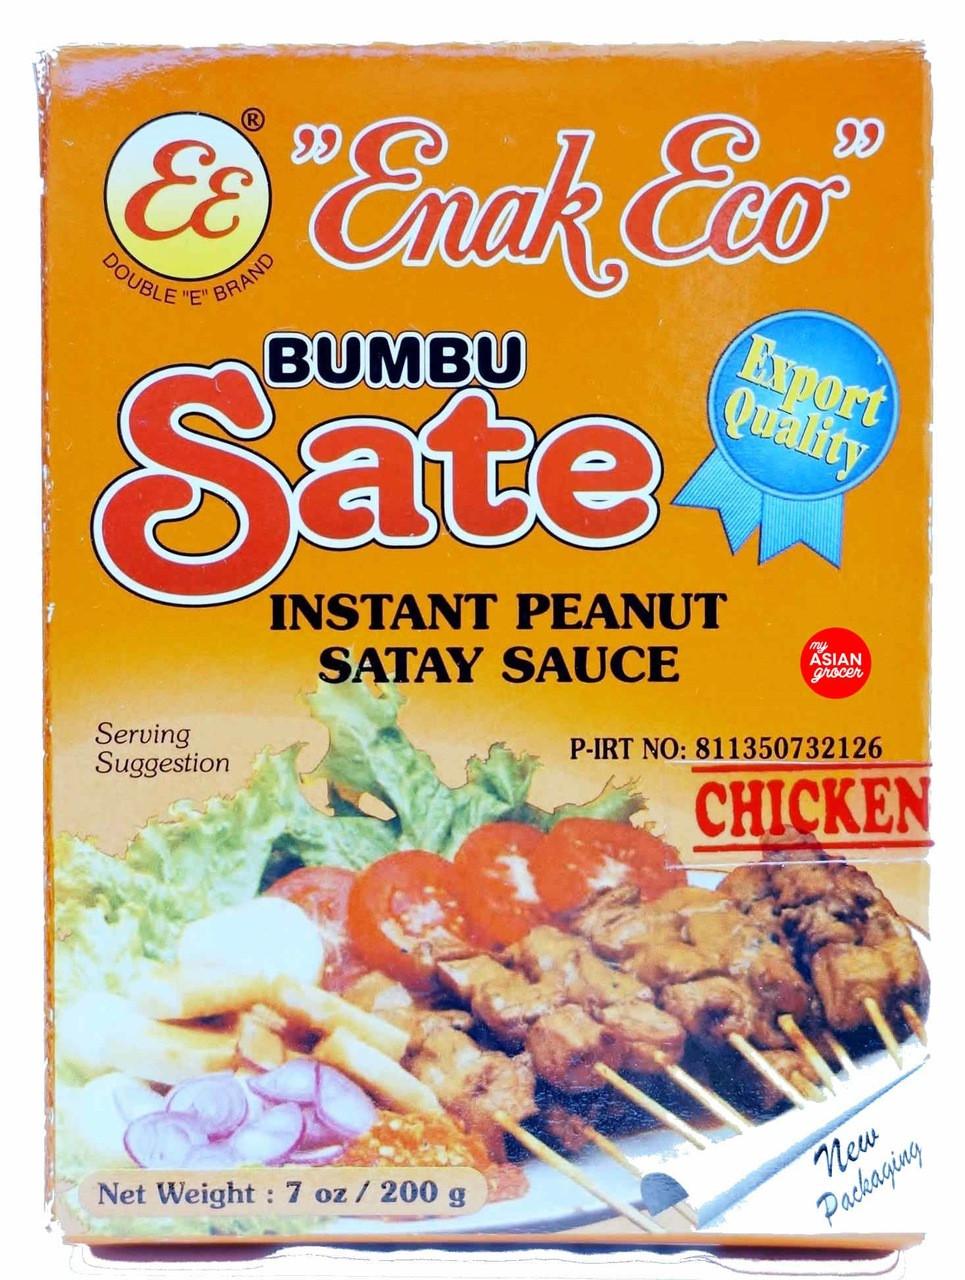 Enak Eco Bumbu Sate (Chicken) 200g